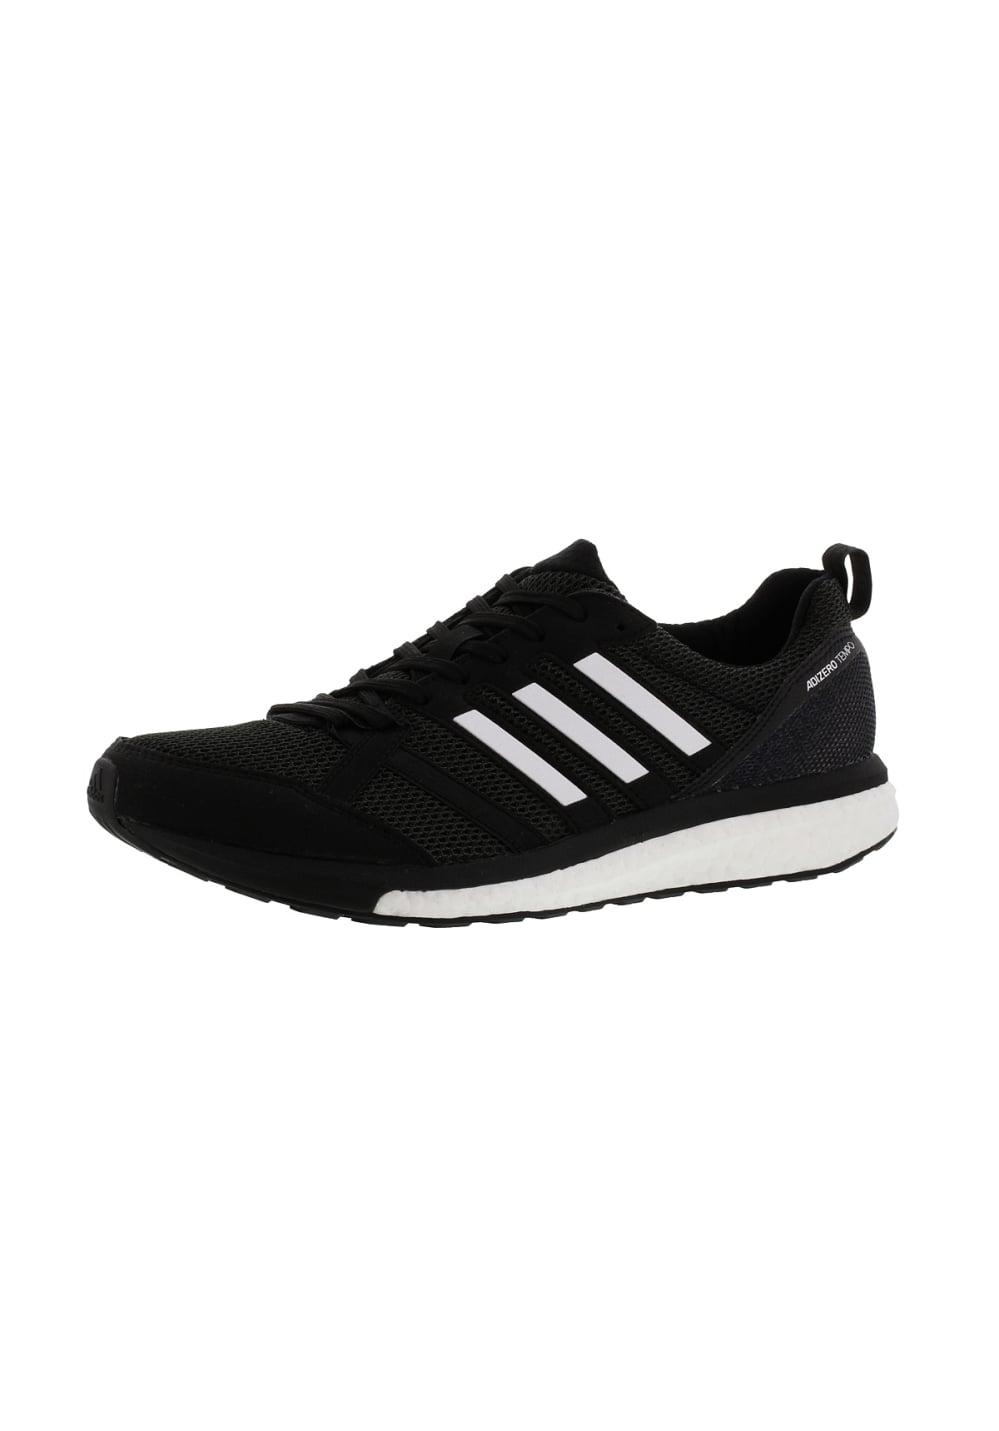 4a5e5d3830aa Adidas Adizero Tempo 9 Running Shoes For Women Black 21run